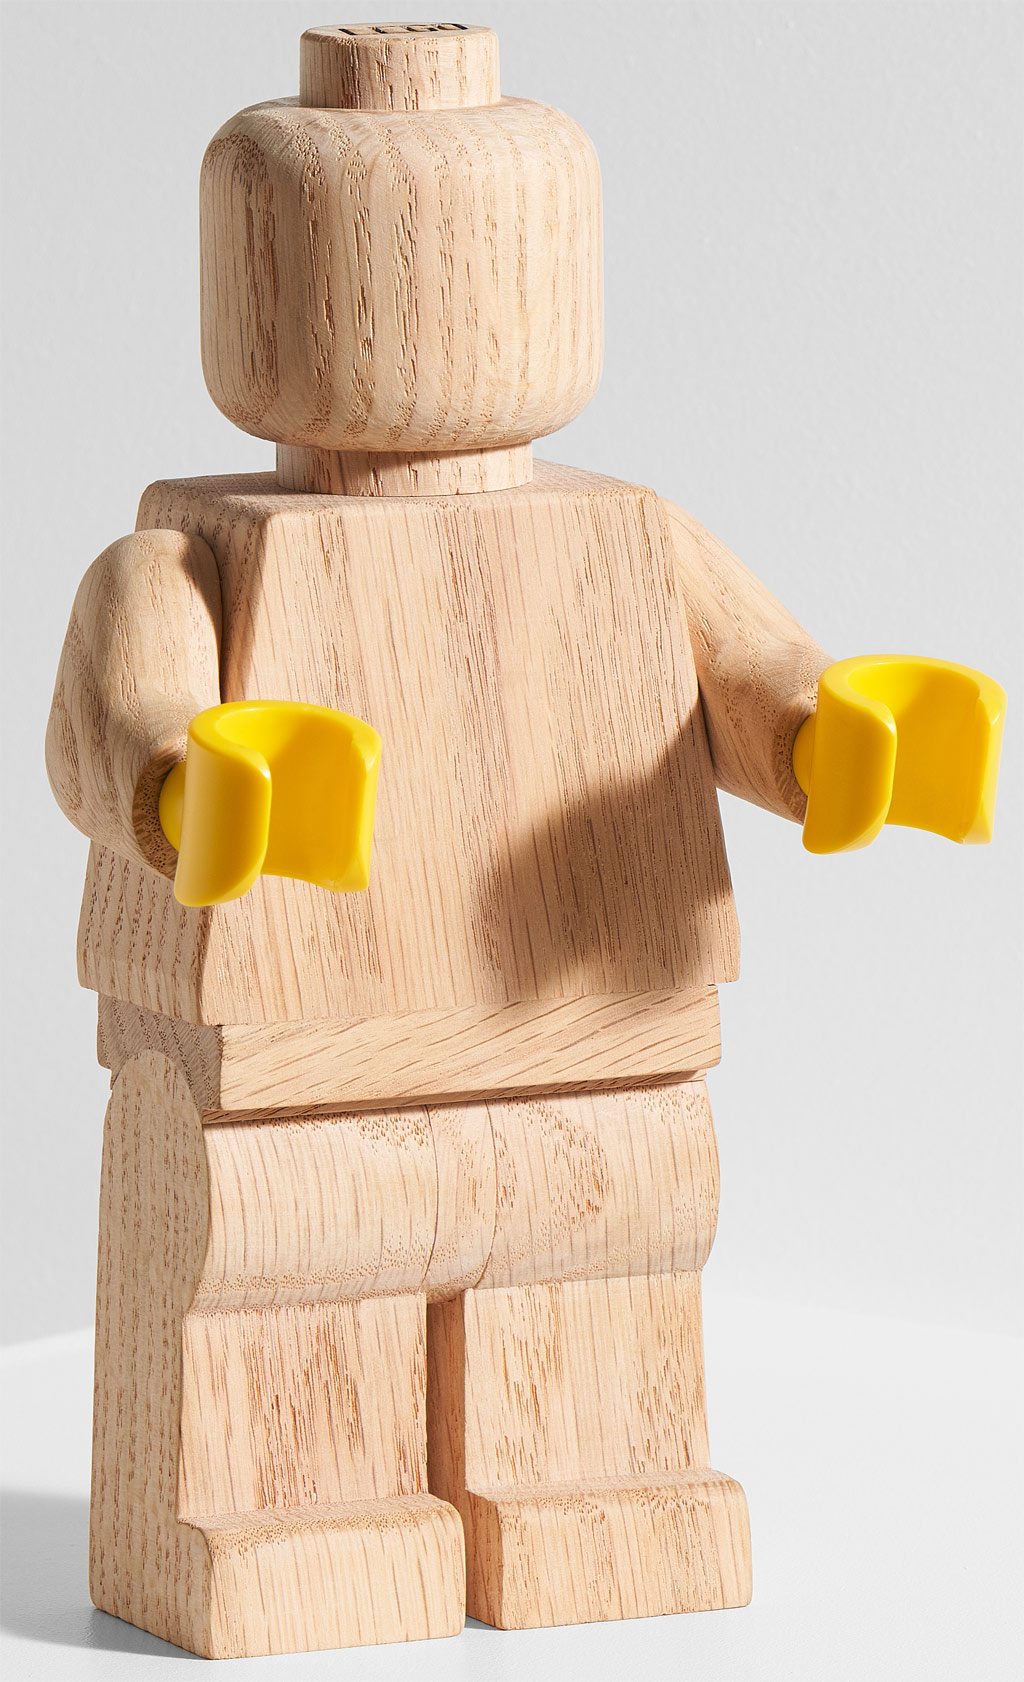 lego-originals-upscaled-wooden-minifigure-853967-2019-front zusammengebaut.com